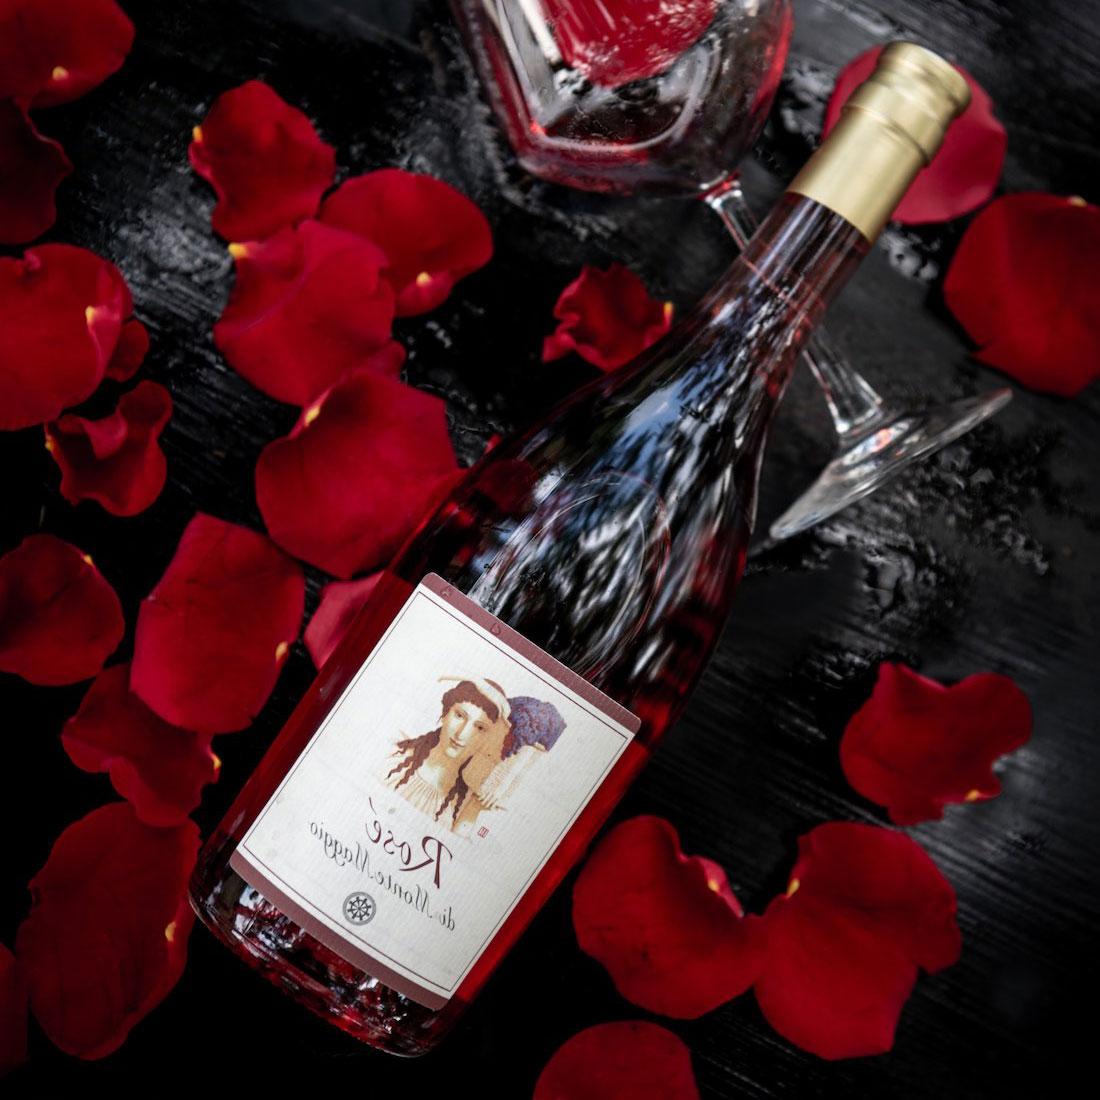 Rosé di Montemaggio is an organic Tuscan wine